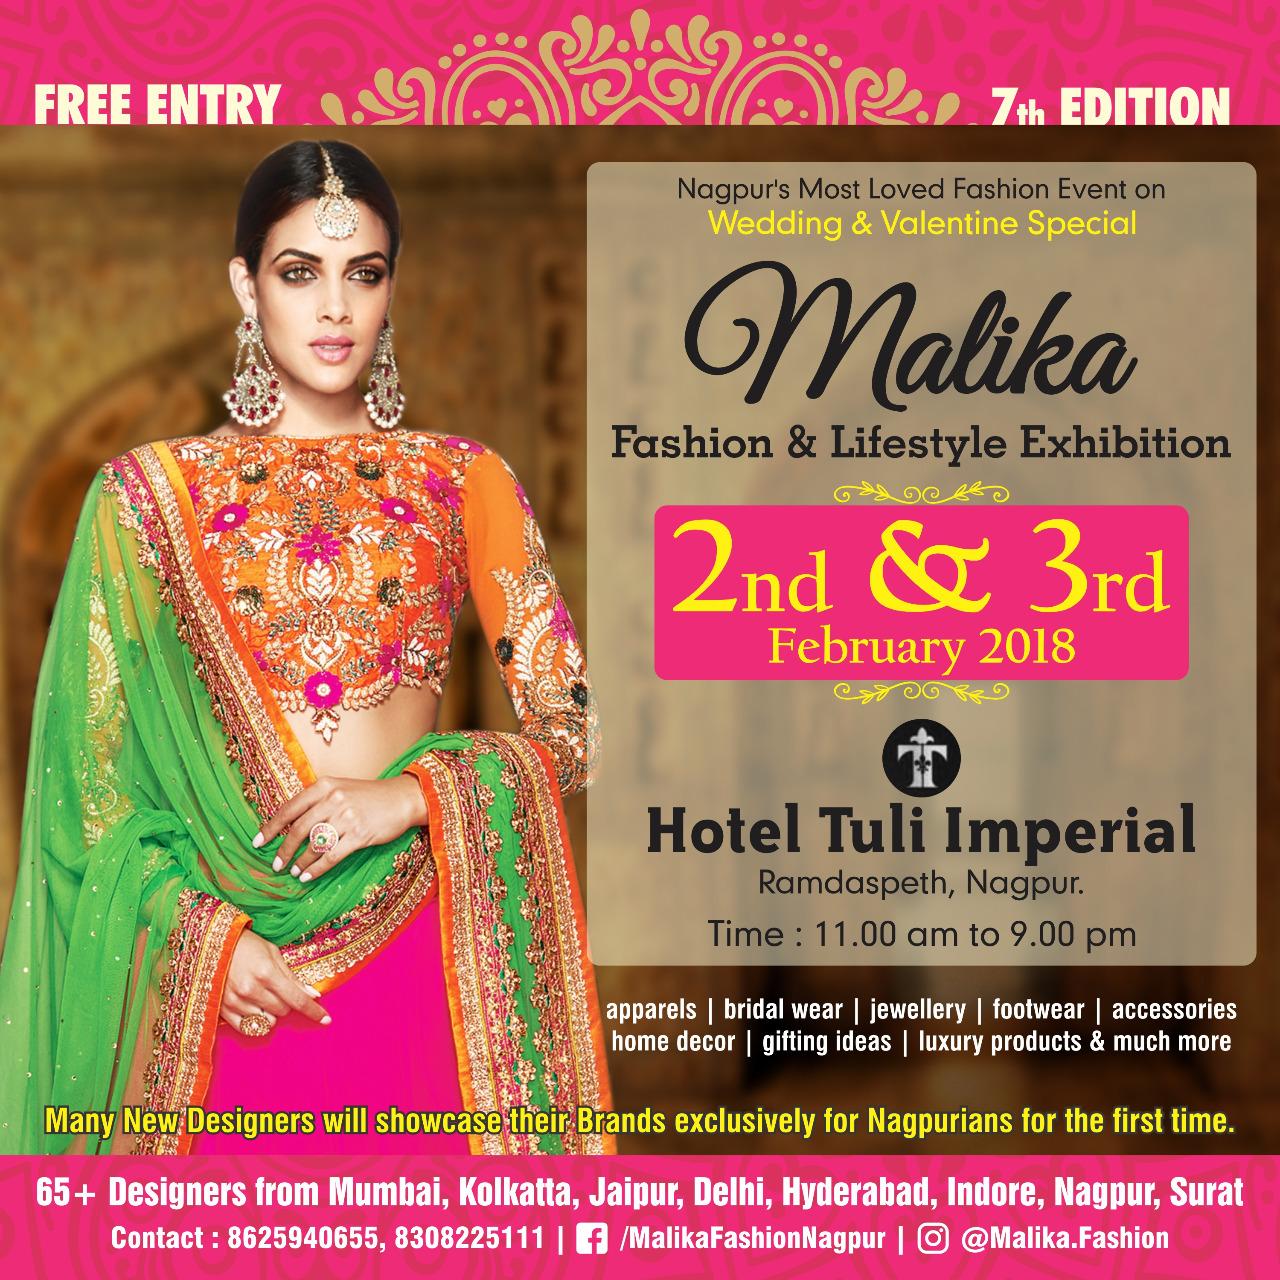 MALIKA Fashion & Lifestyle Exhibition